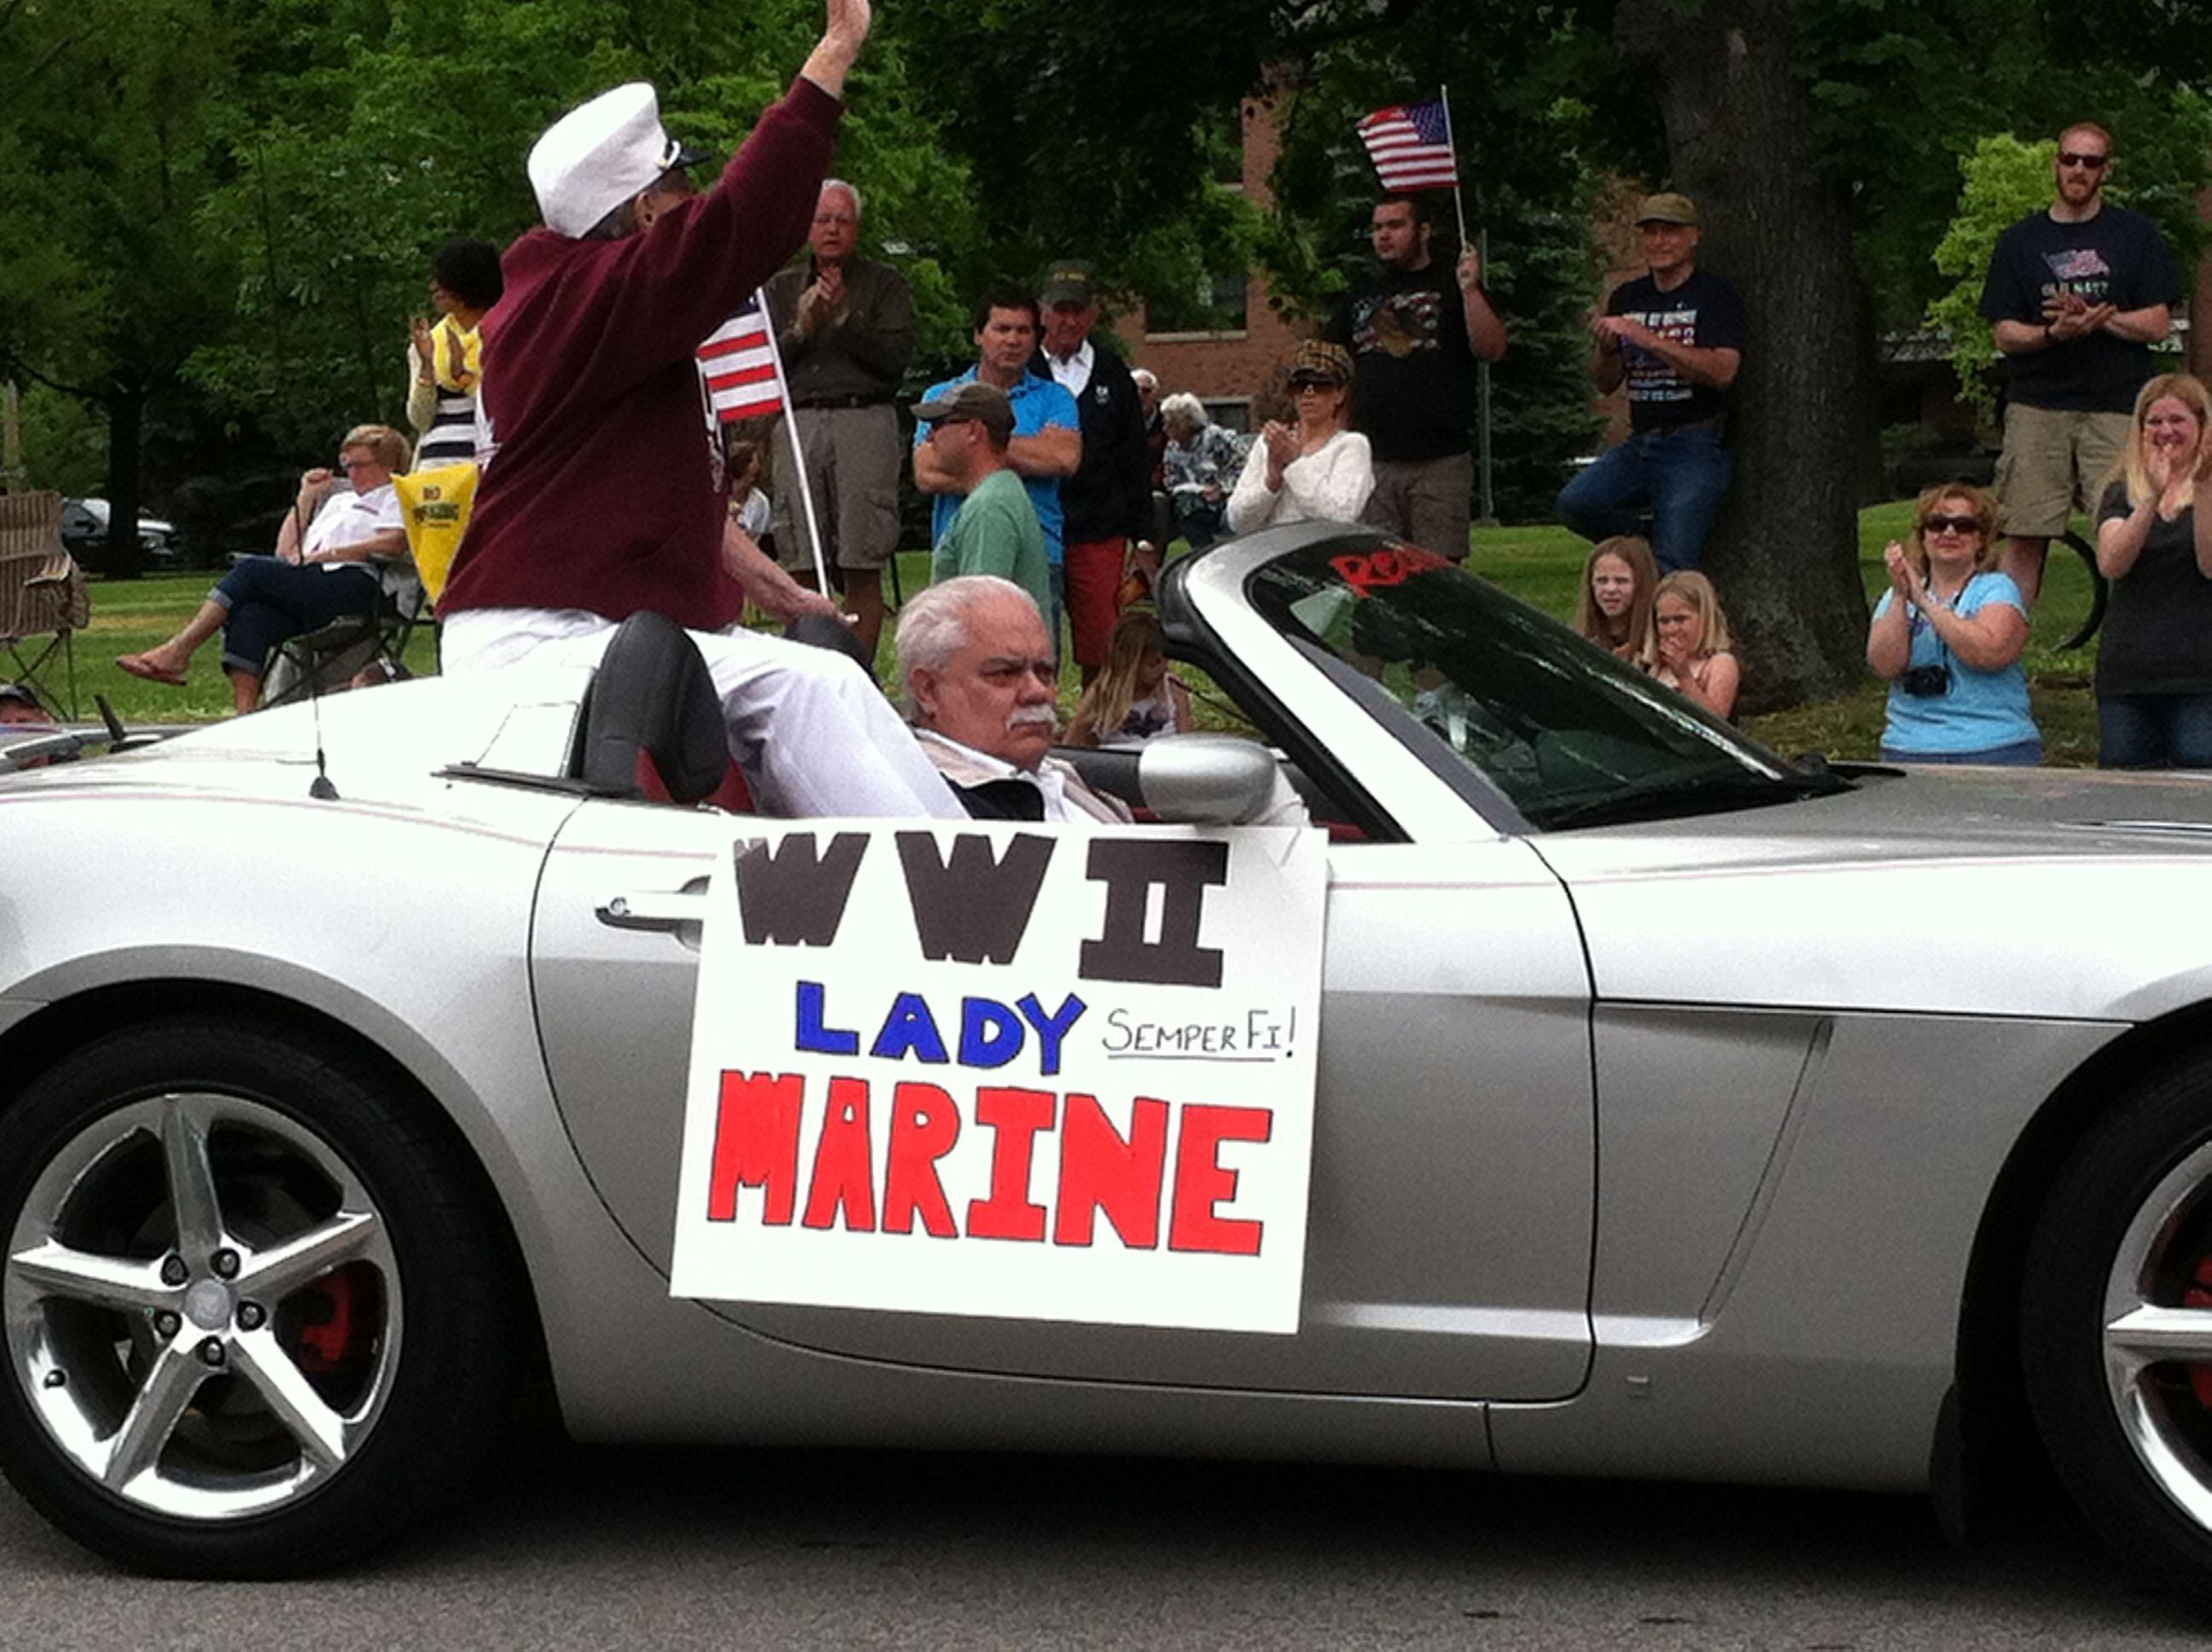 WWII lady marine Memorial Day 2013